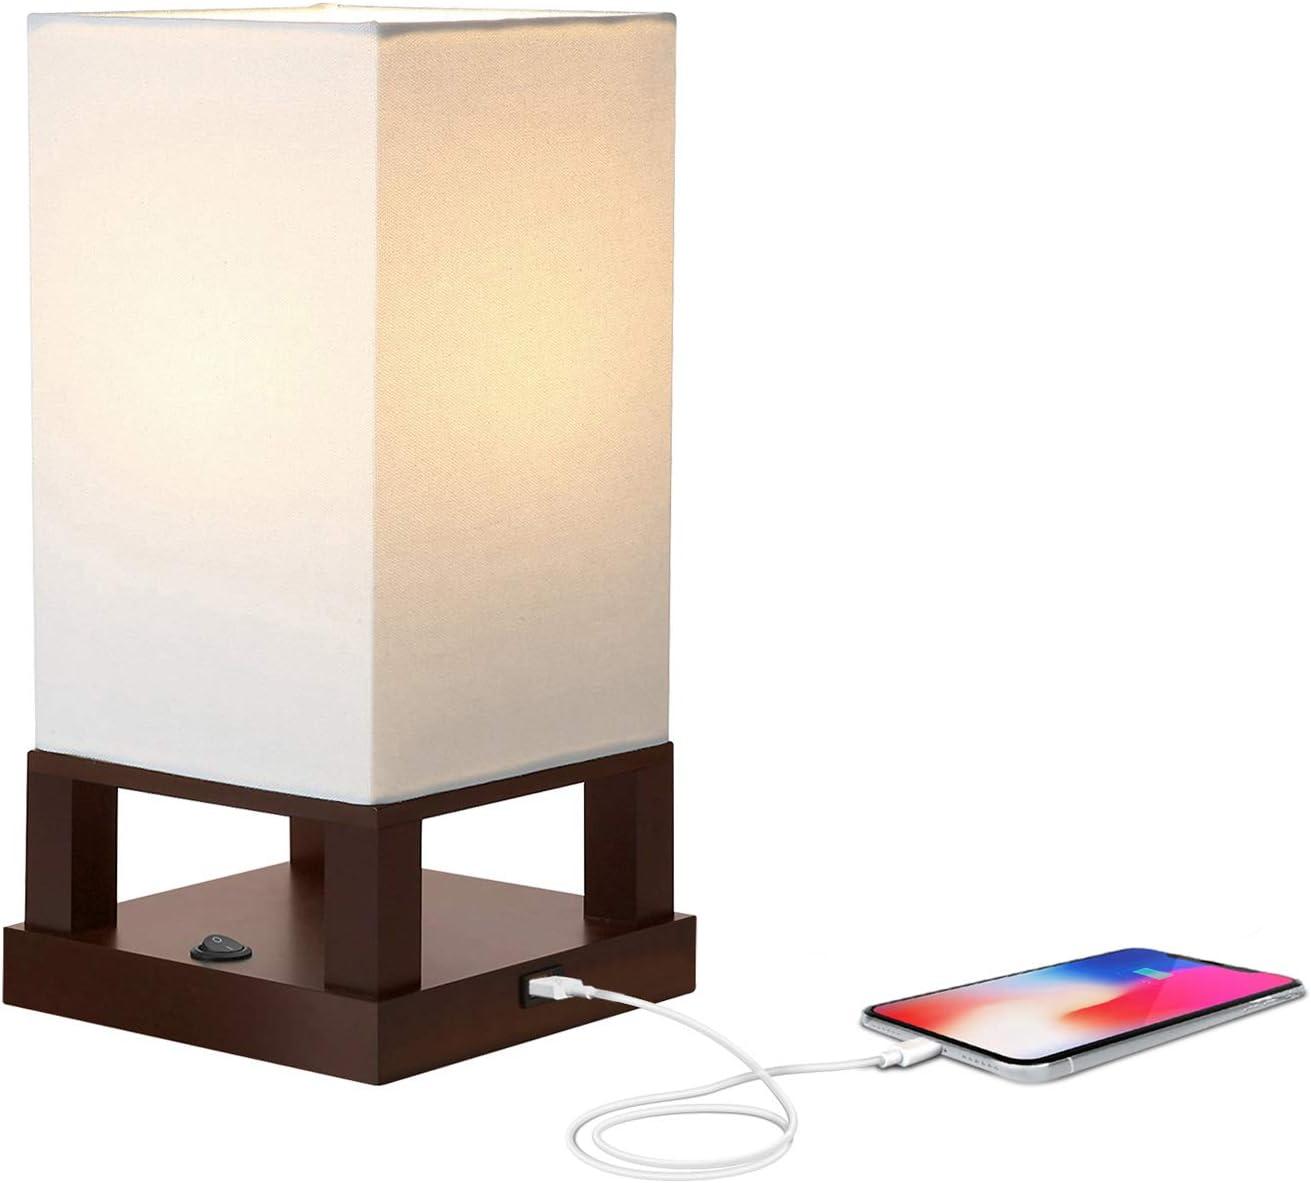 Brightech Maxwell - Bedroom Nightstand 新色追加 Lamp USB Ports Mod with – 高品質